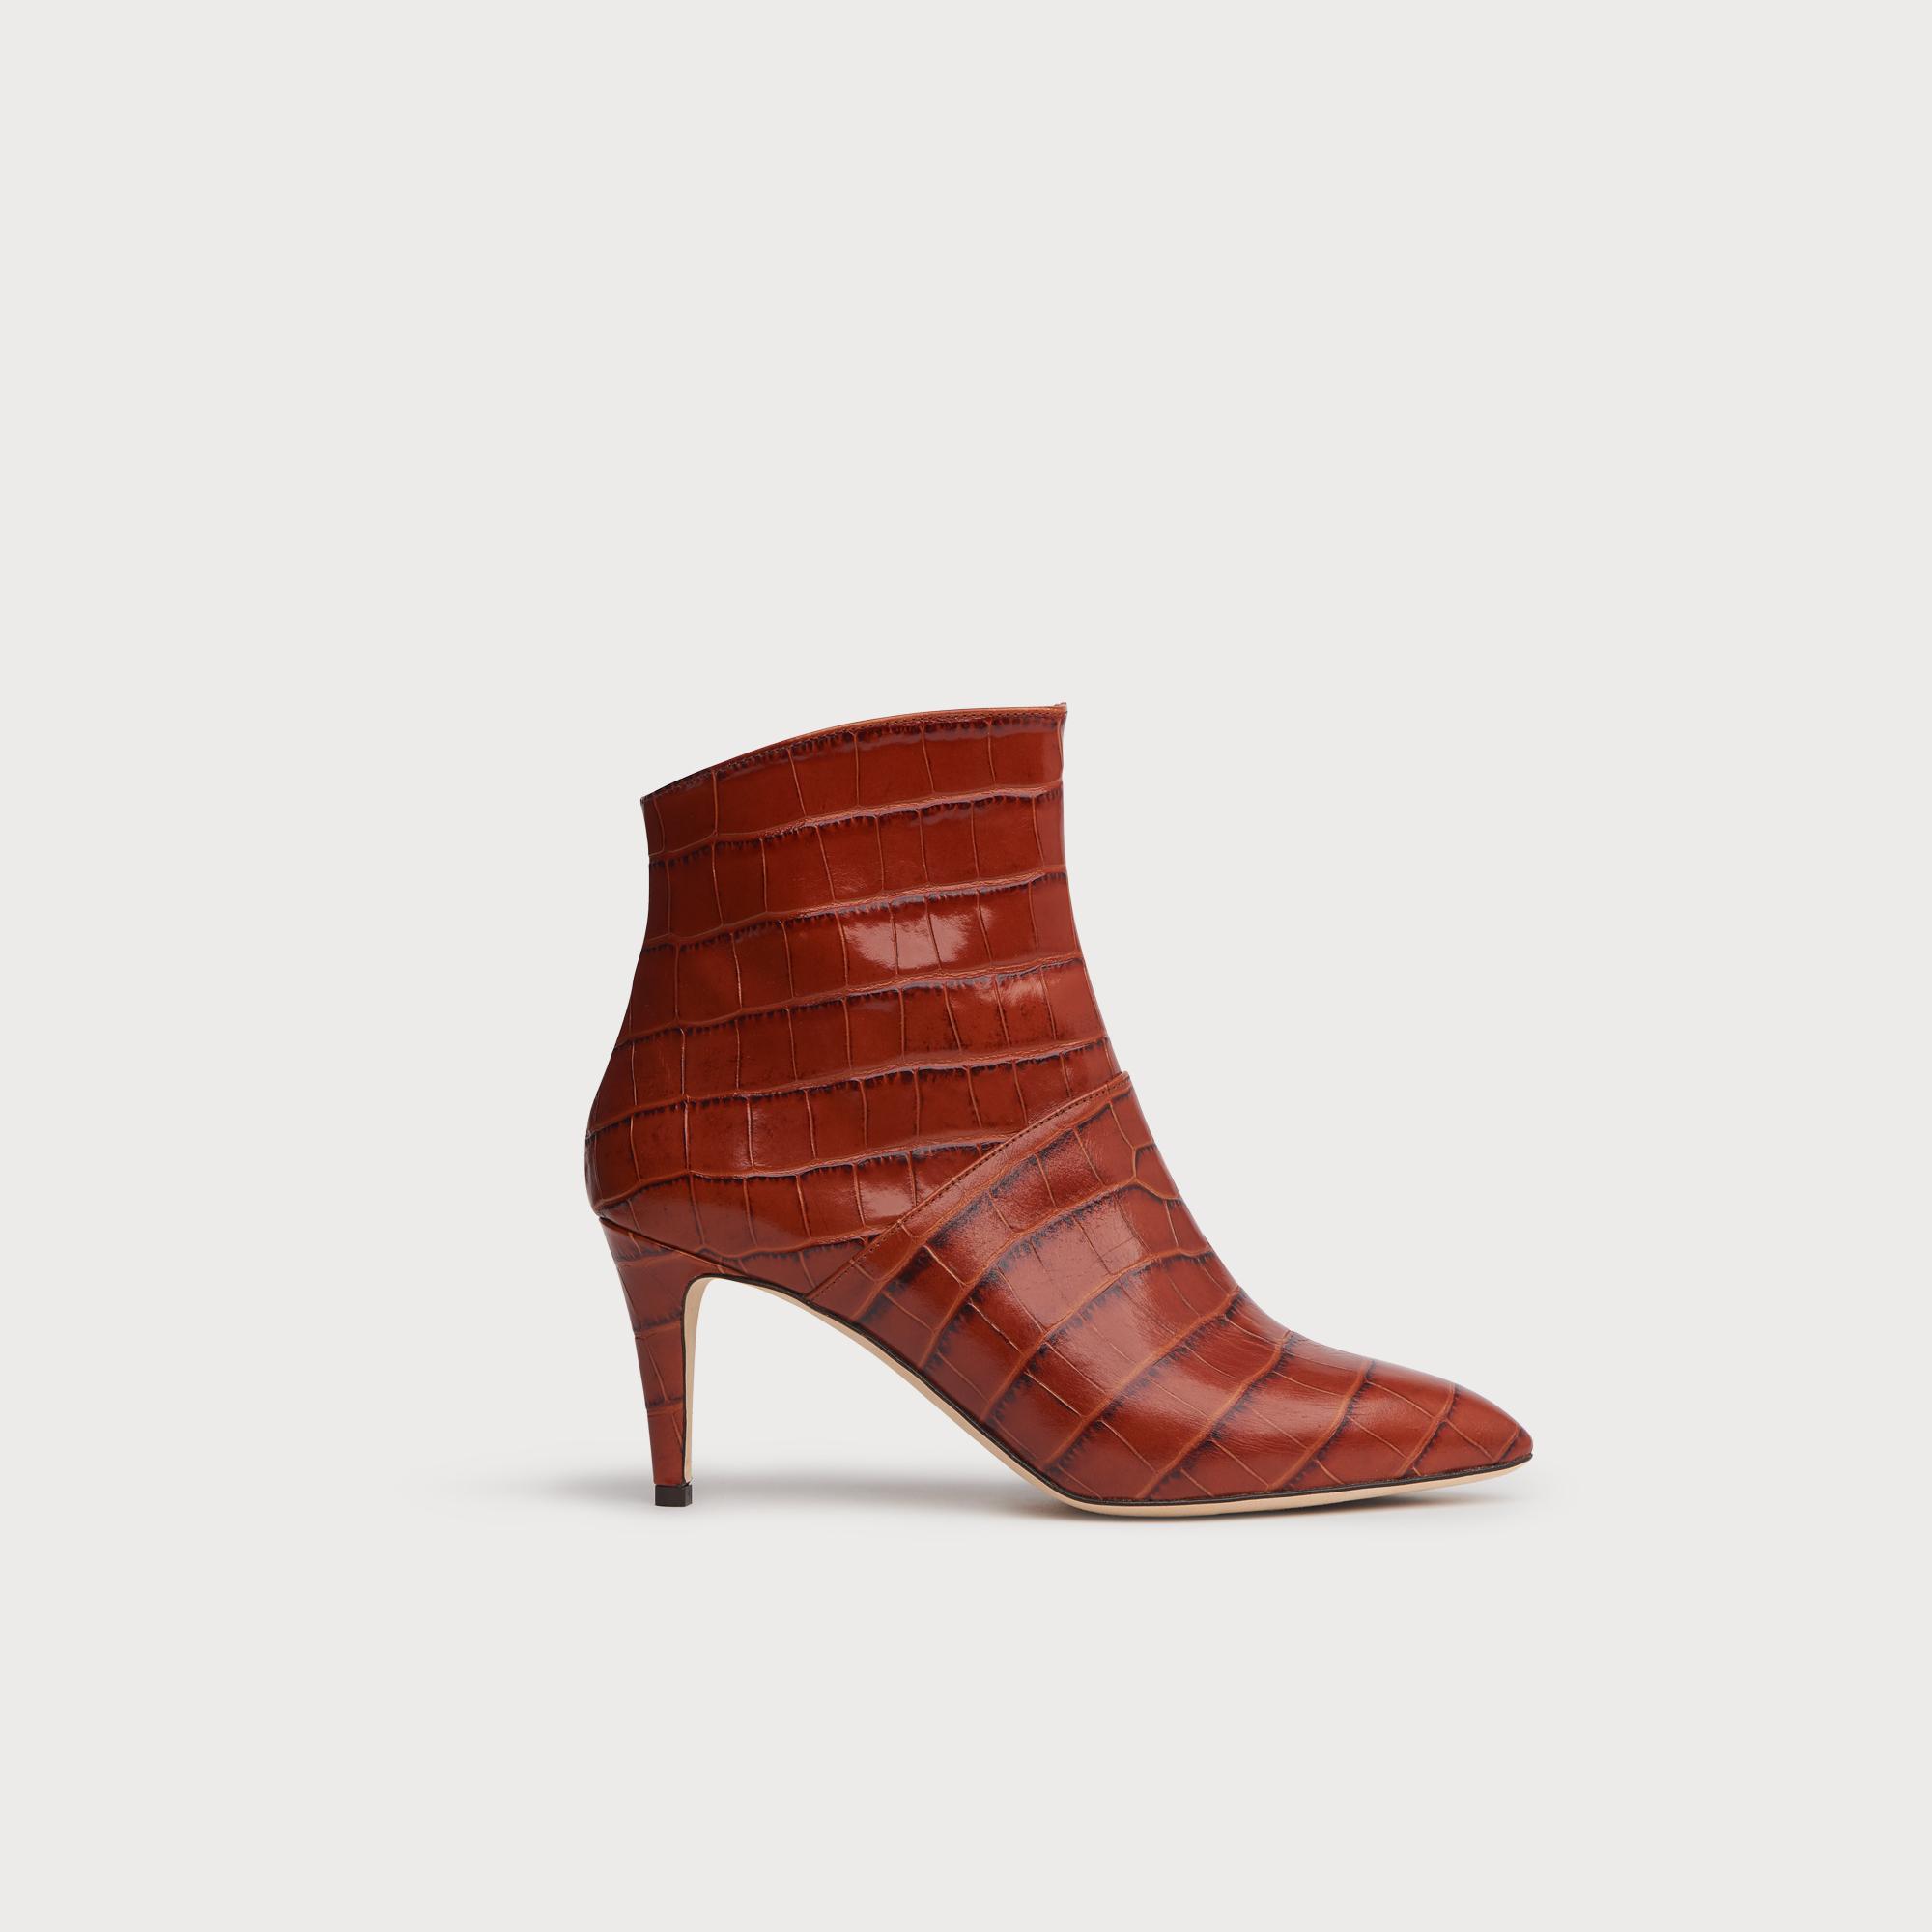 082b7f9c40a1a Bethan Caramel Croc Effect Ankle Boots